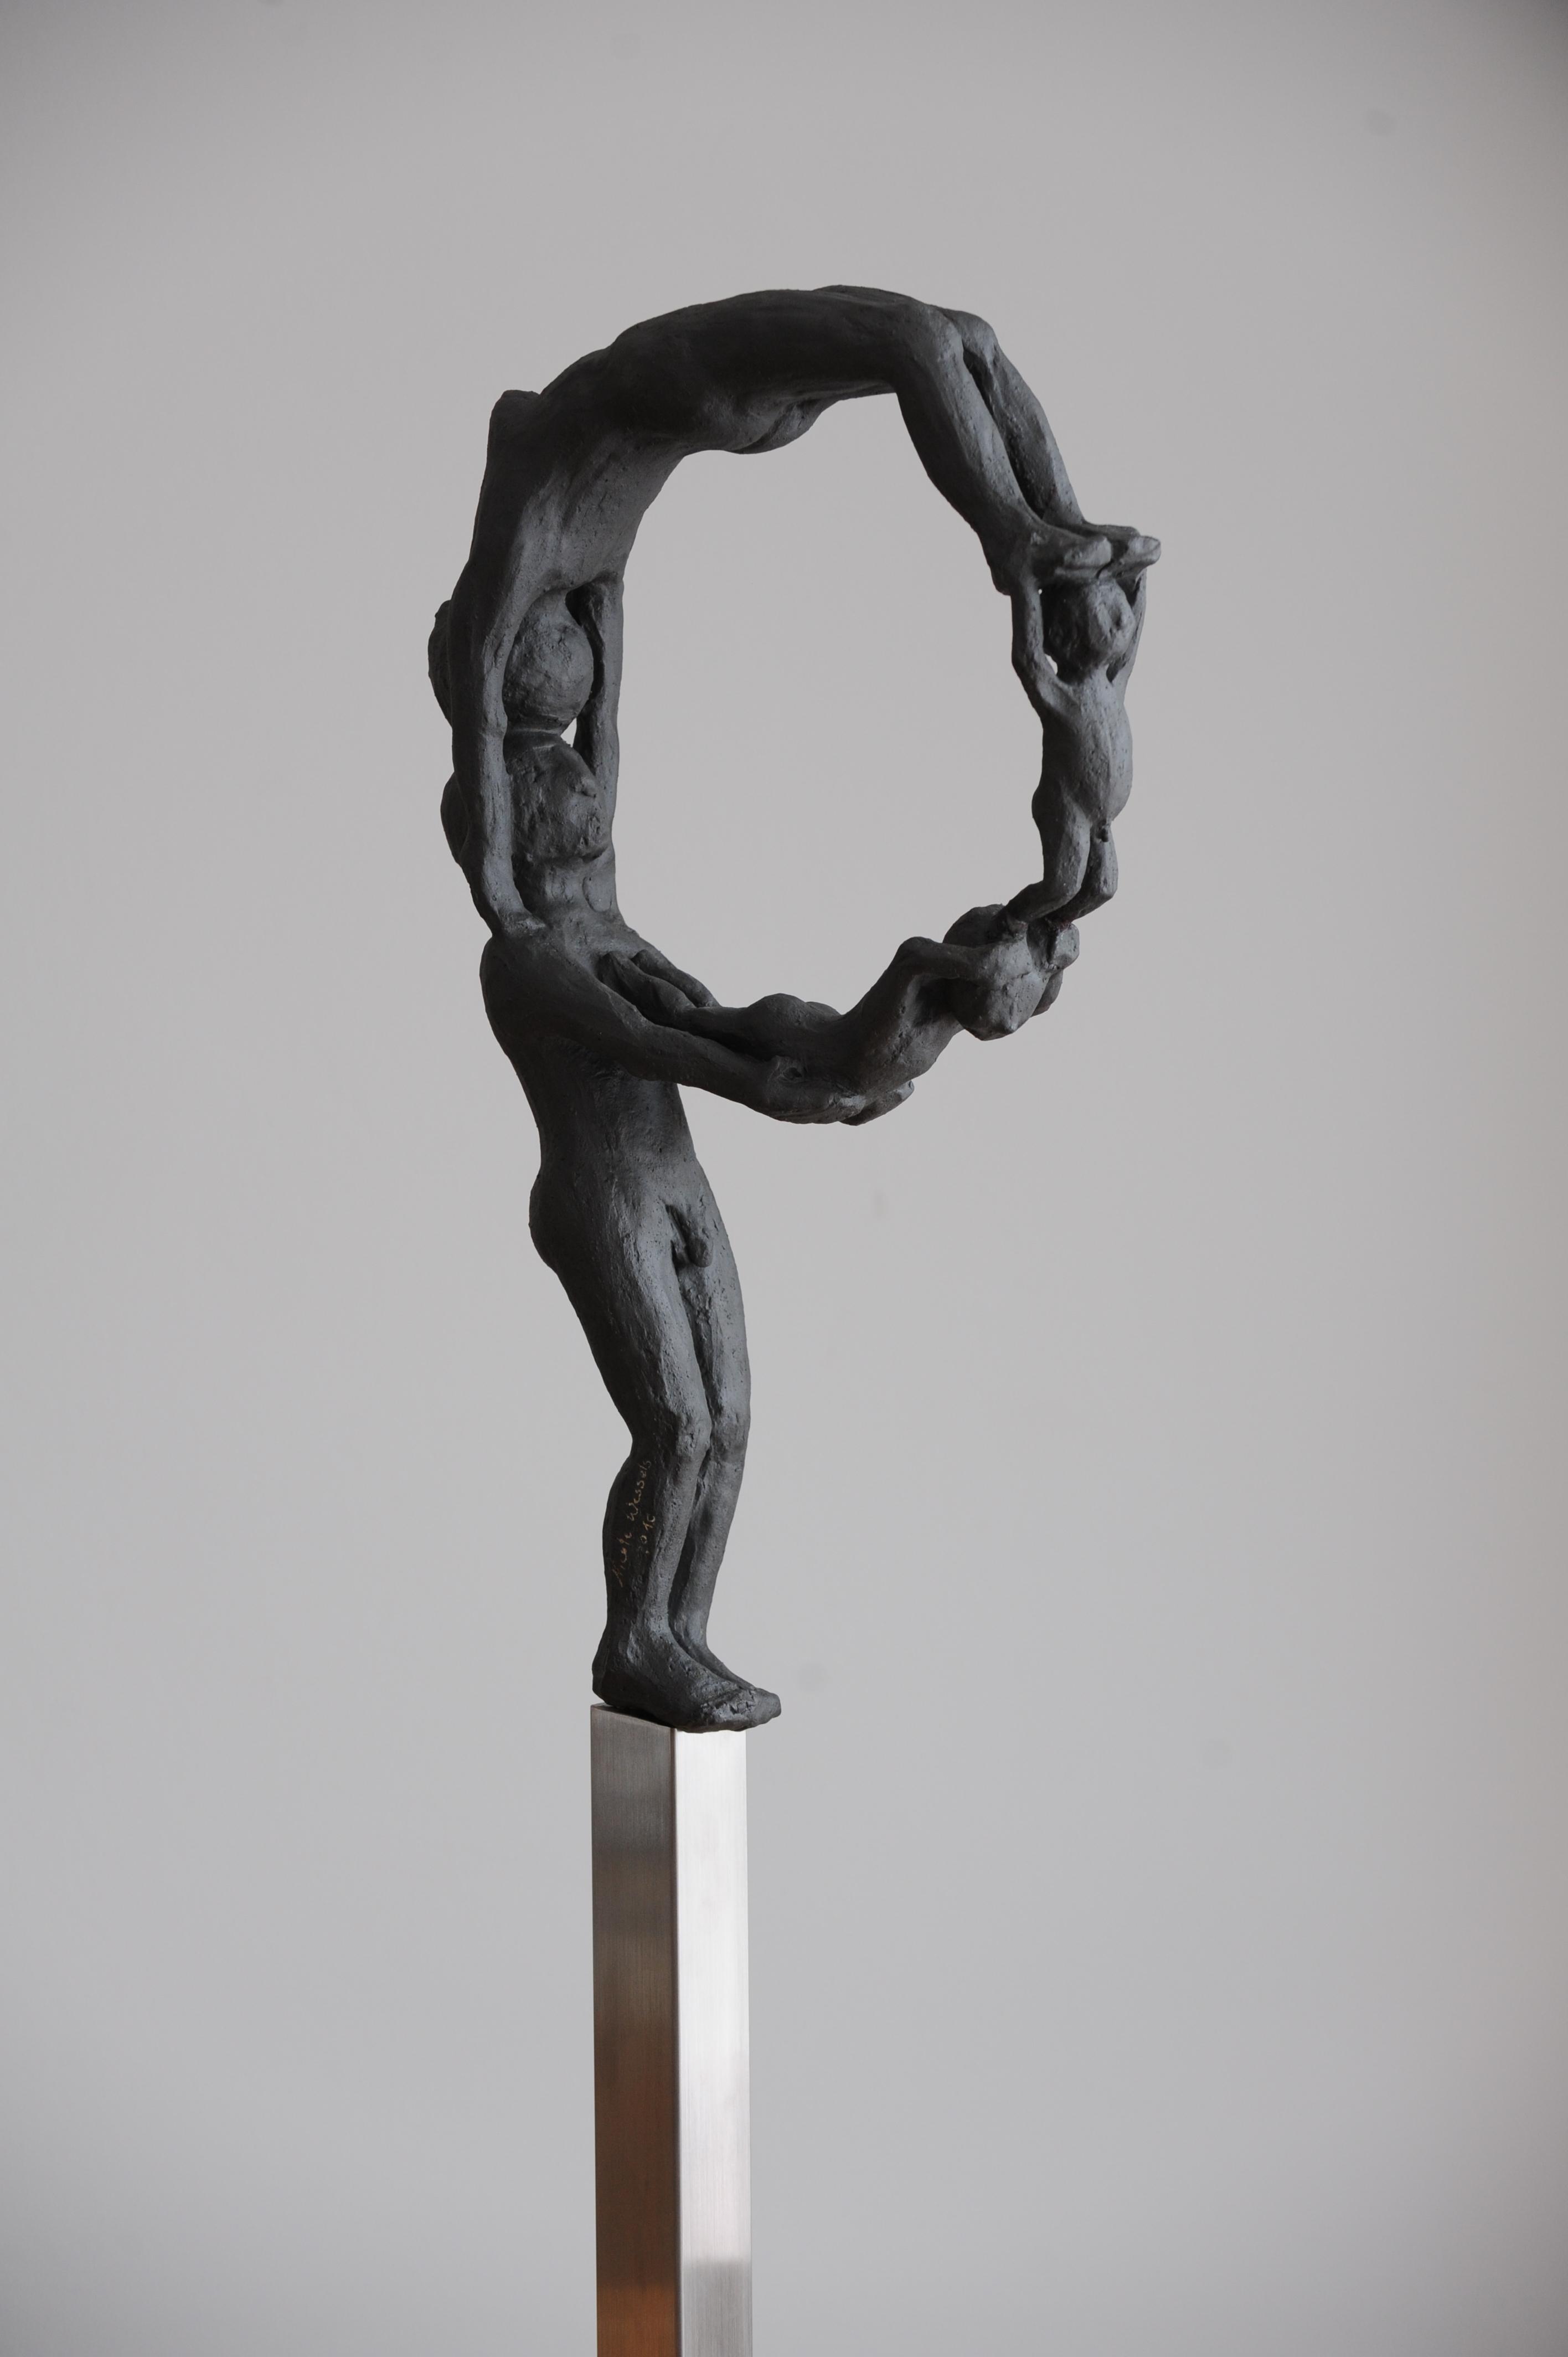 Neun, 2010 (Keramik 40x60x10cm, auf Edelstahlsockel)